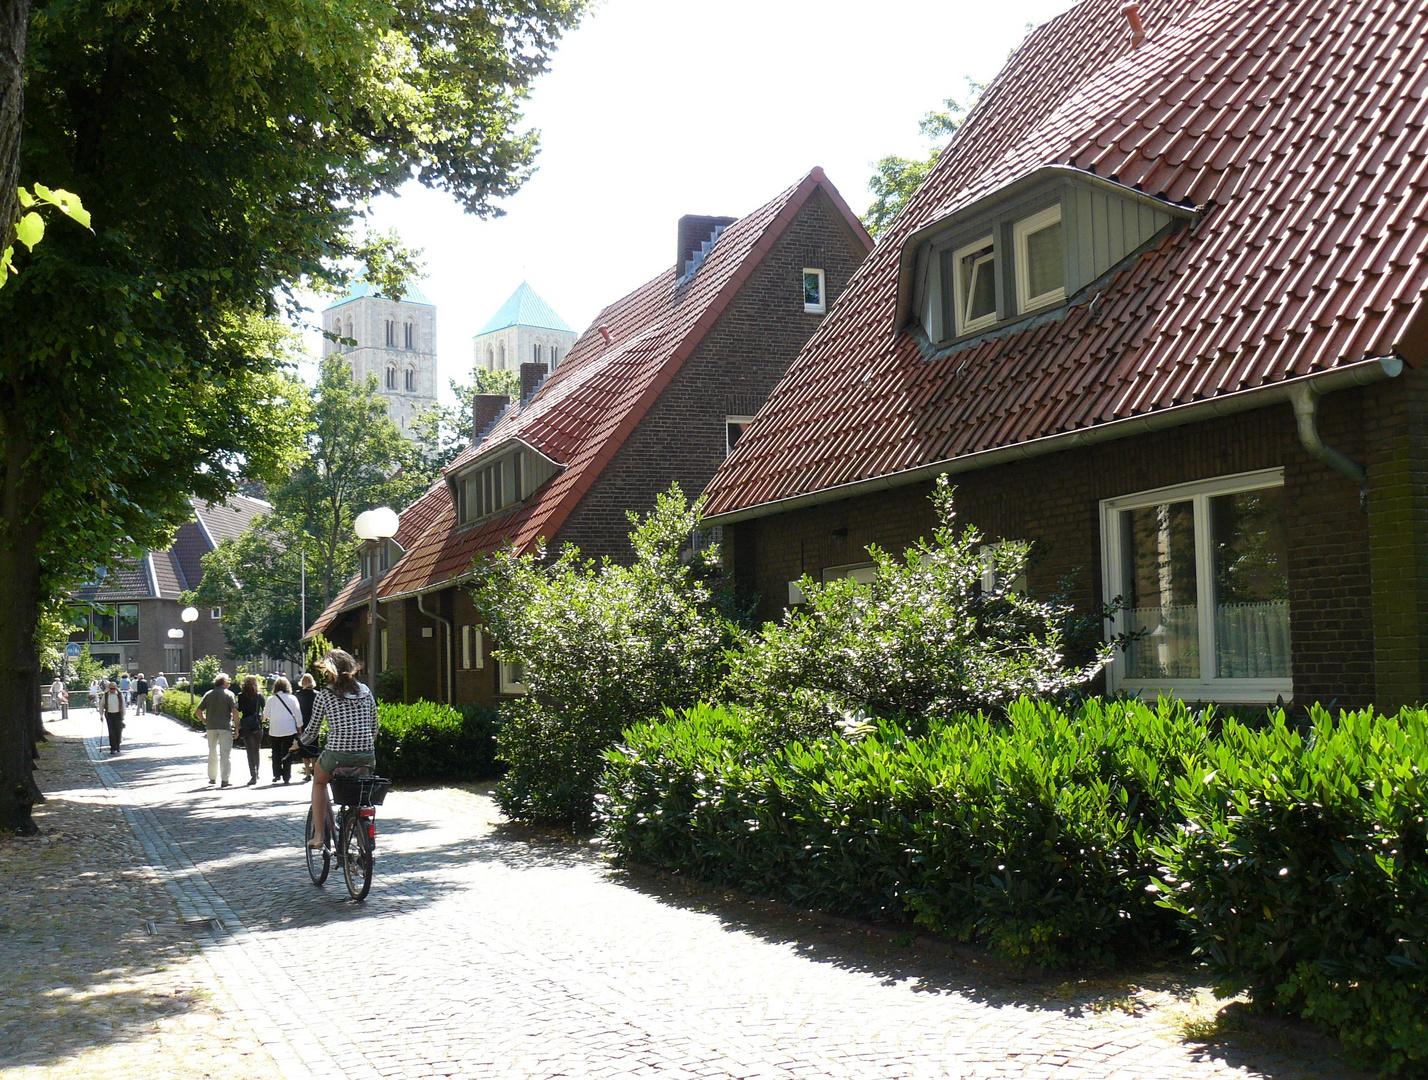 Münster - alltags